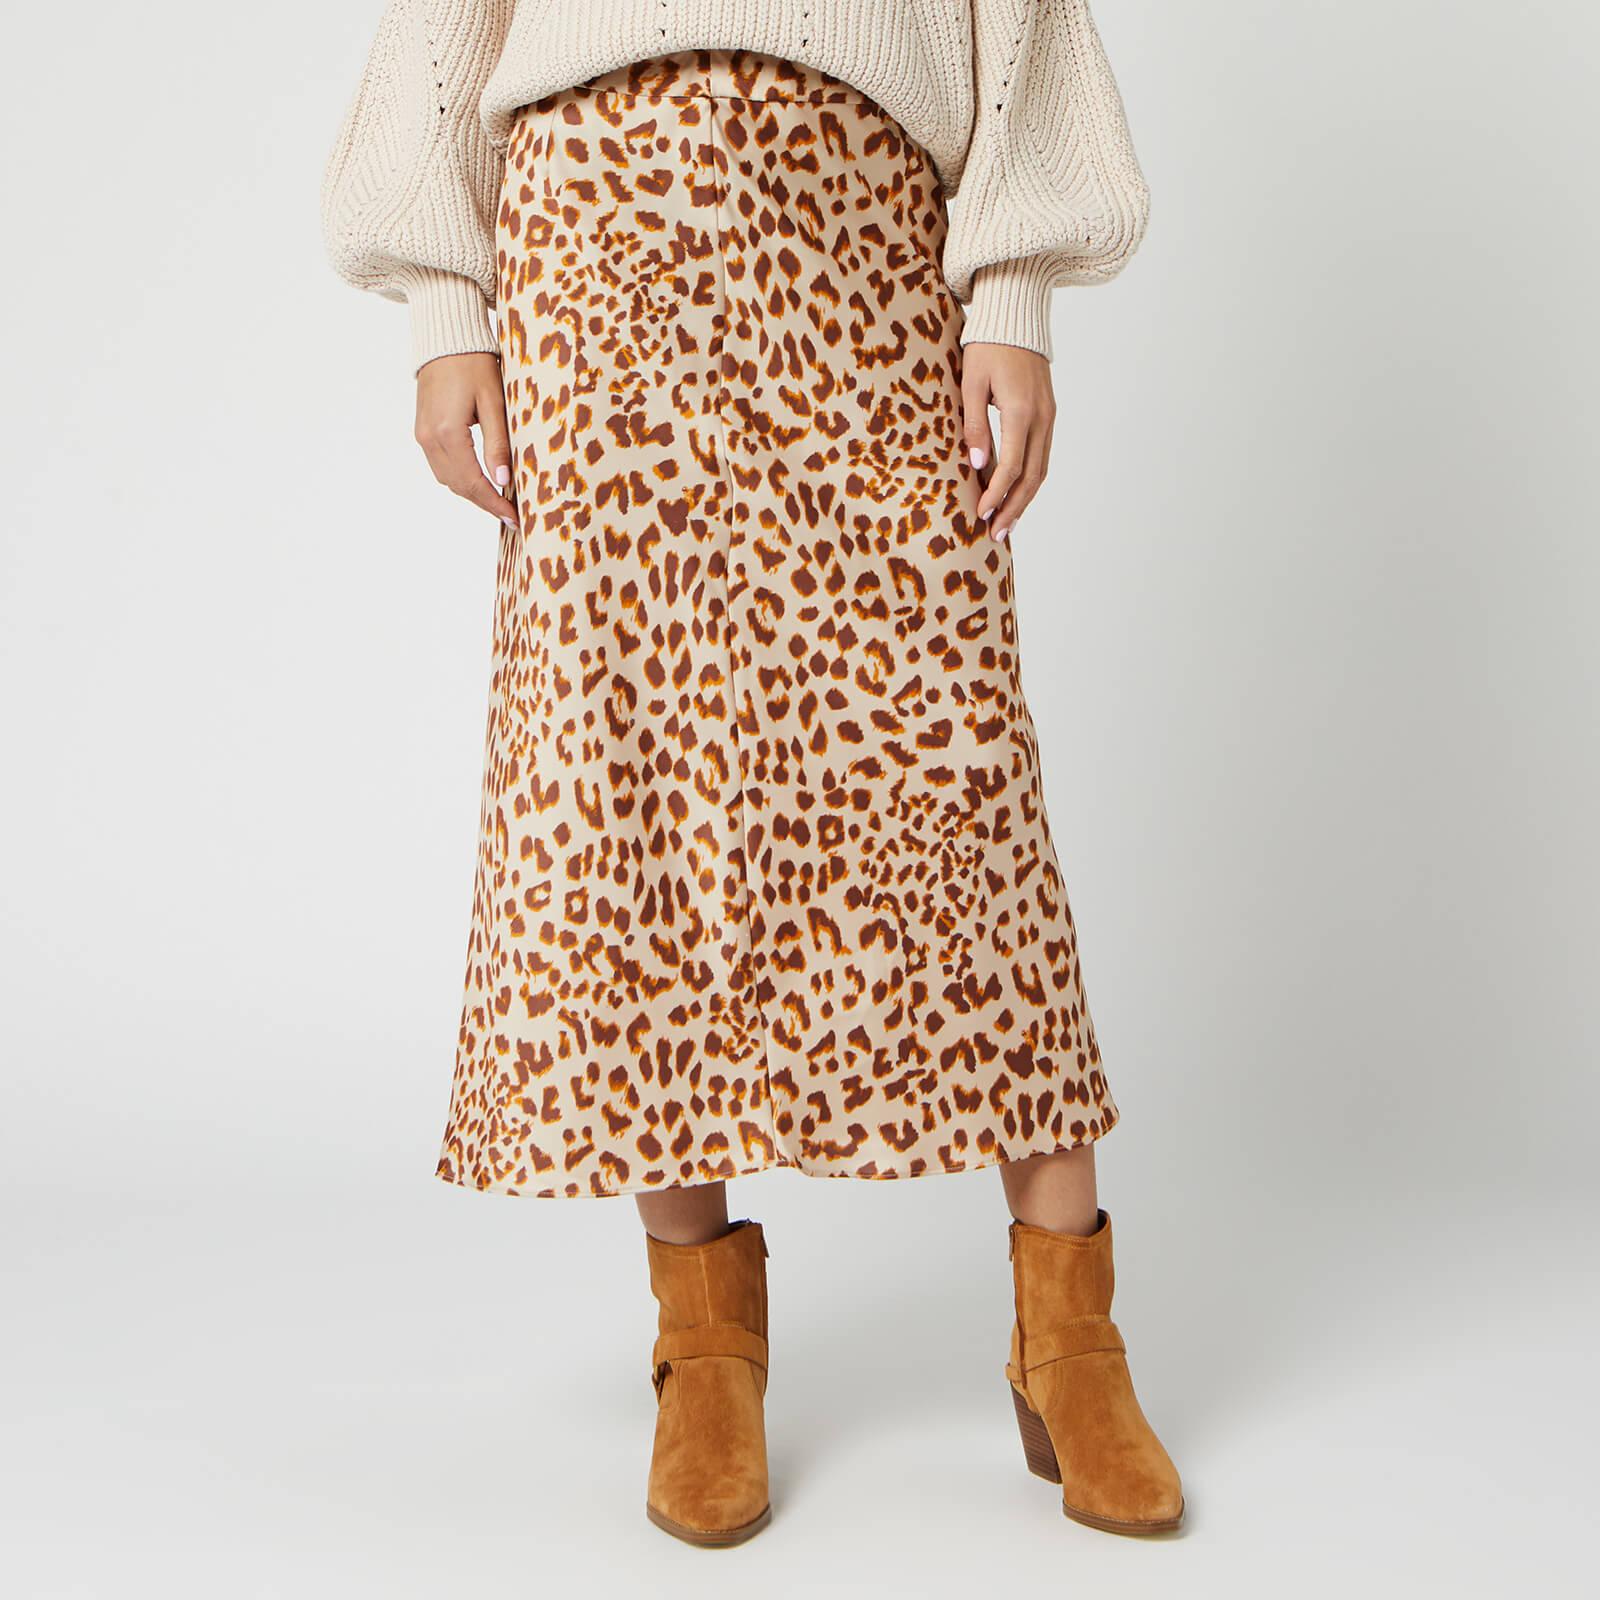 Free People Women's Normani Bias Skirt - Brown Leopard - US 6/UK 10